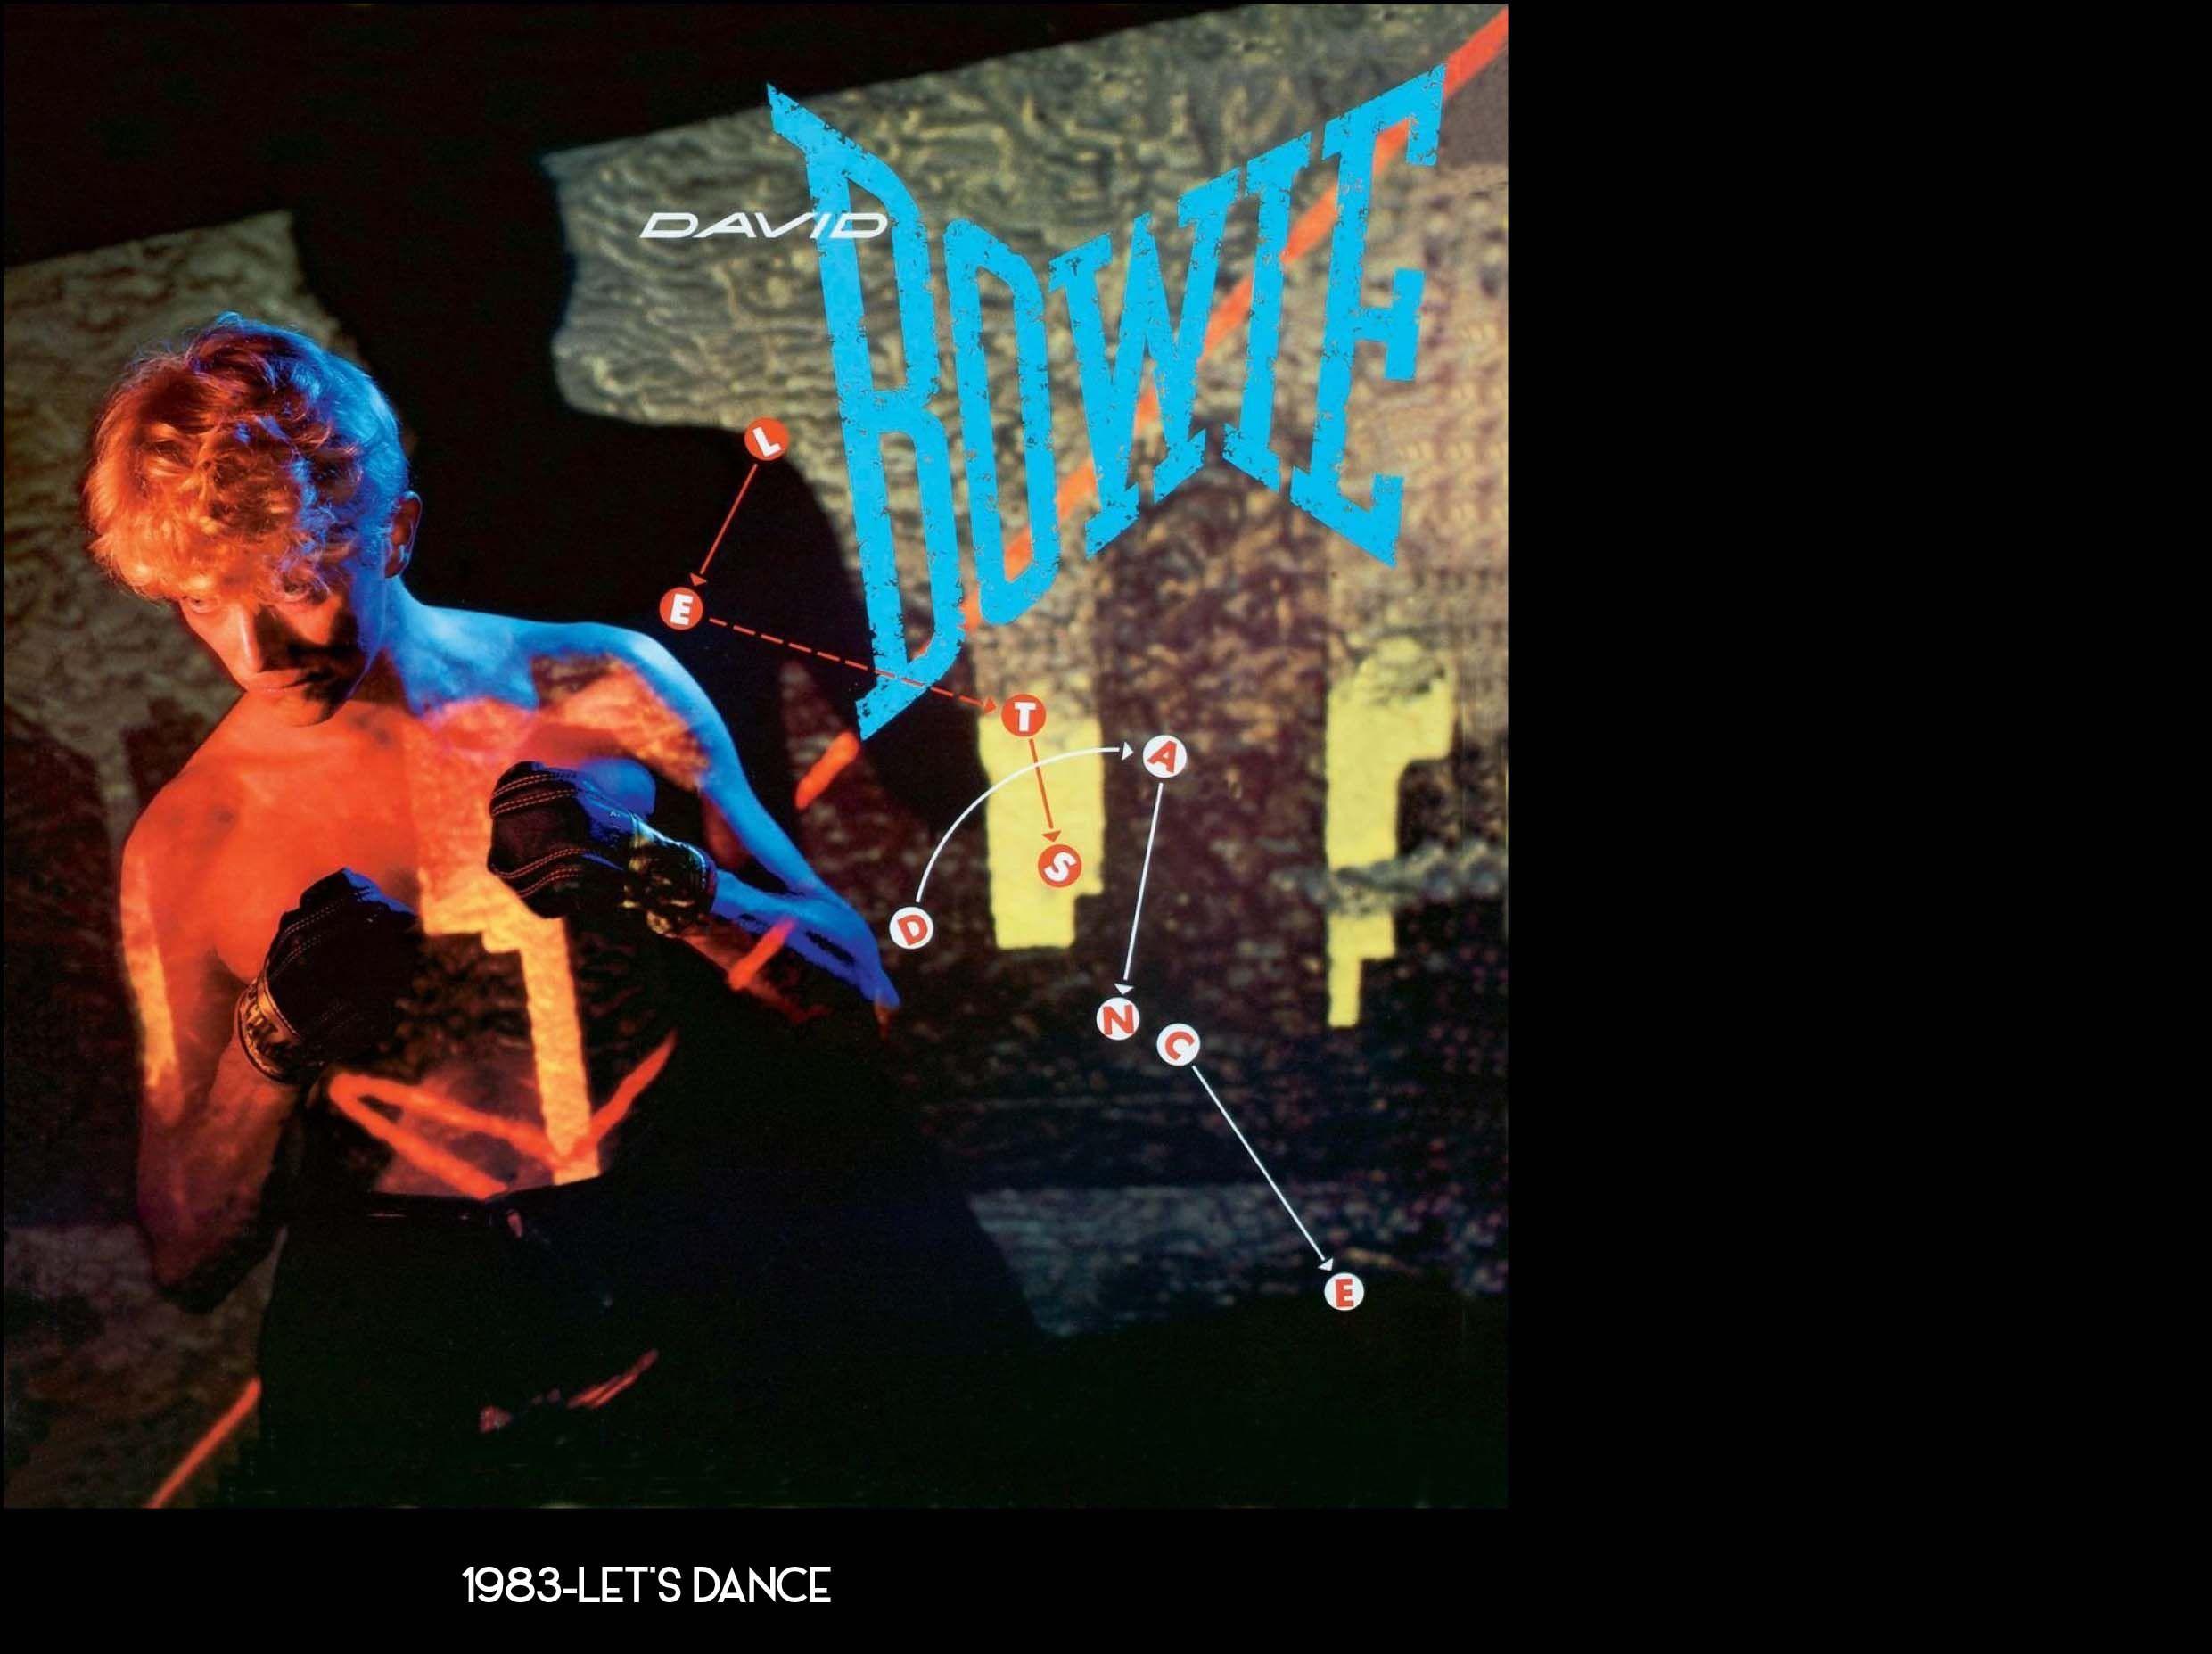 DAVID BOWIE 1983 LET'S DANCE Immagini, Ricordi